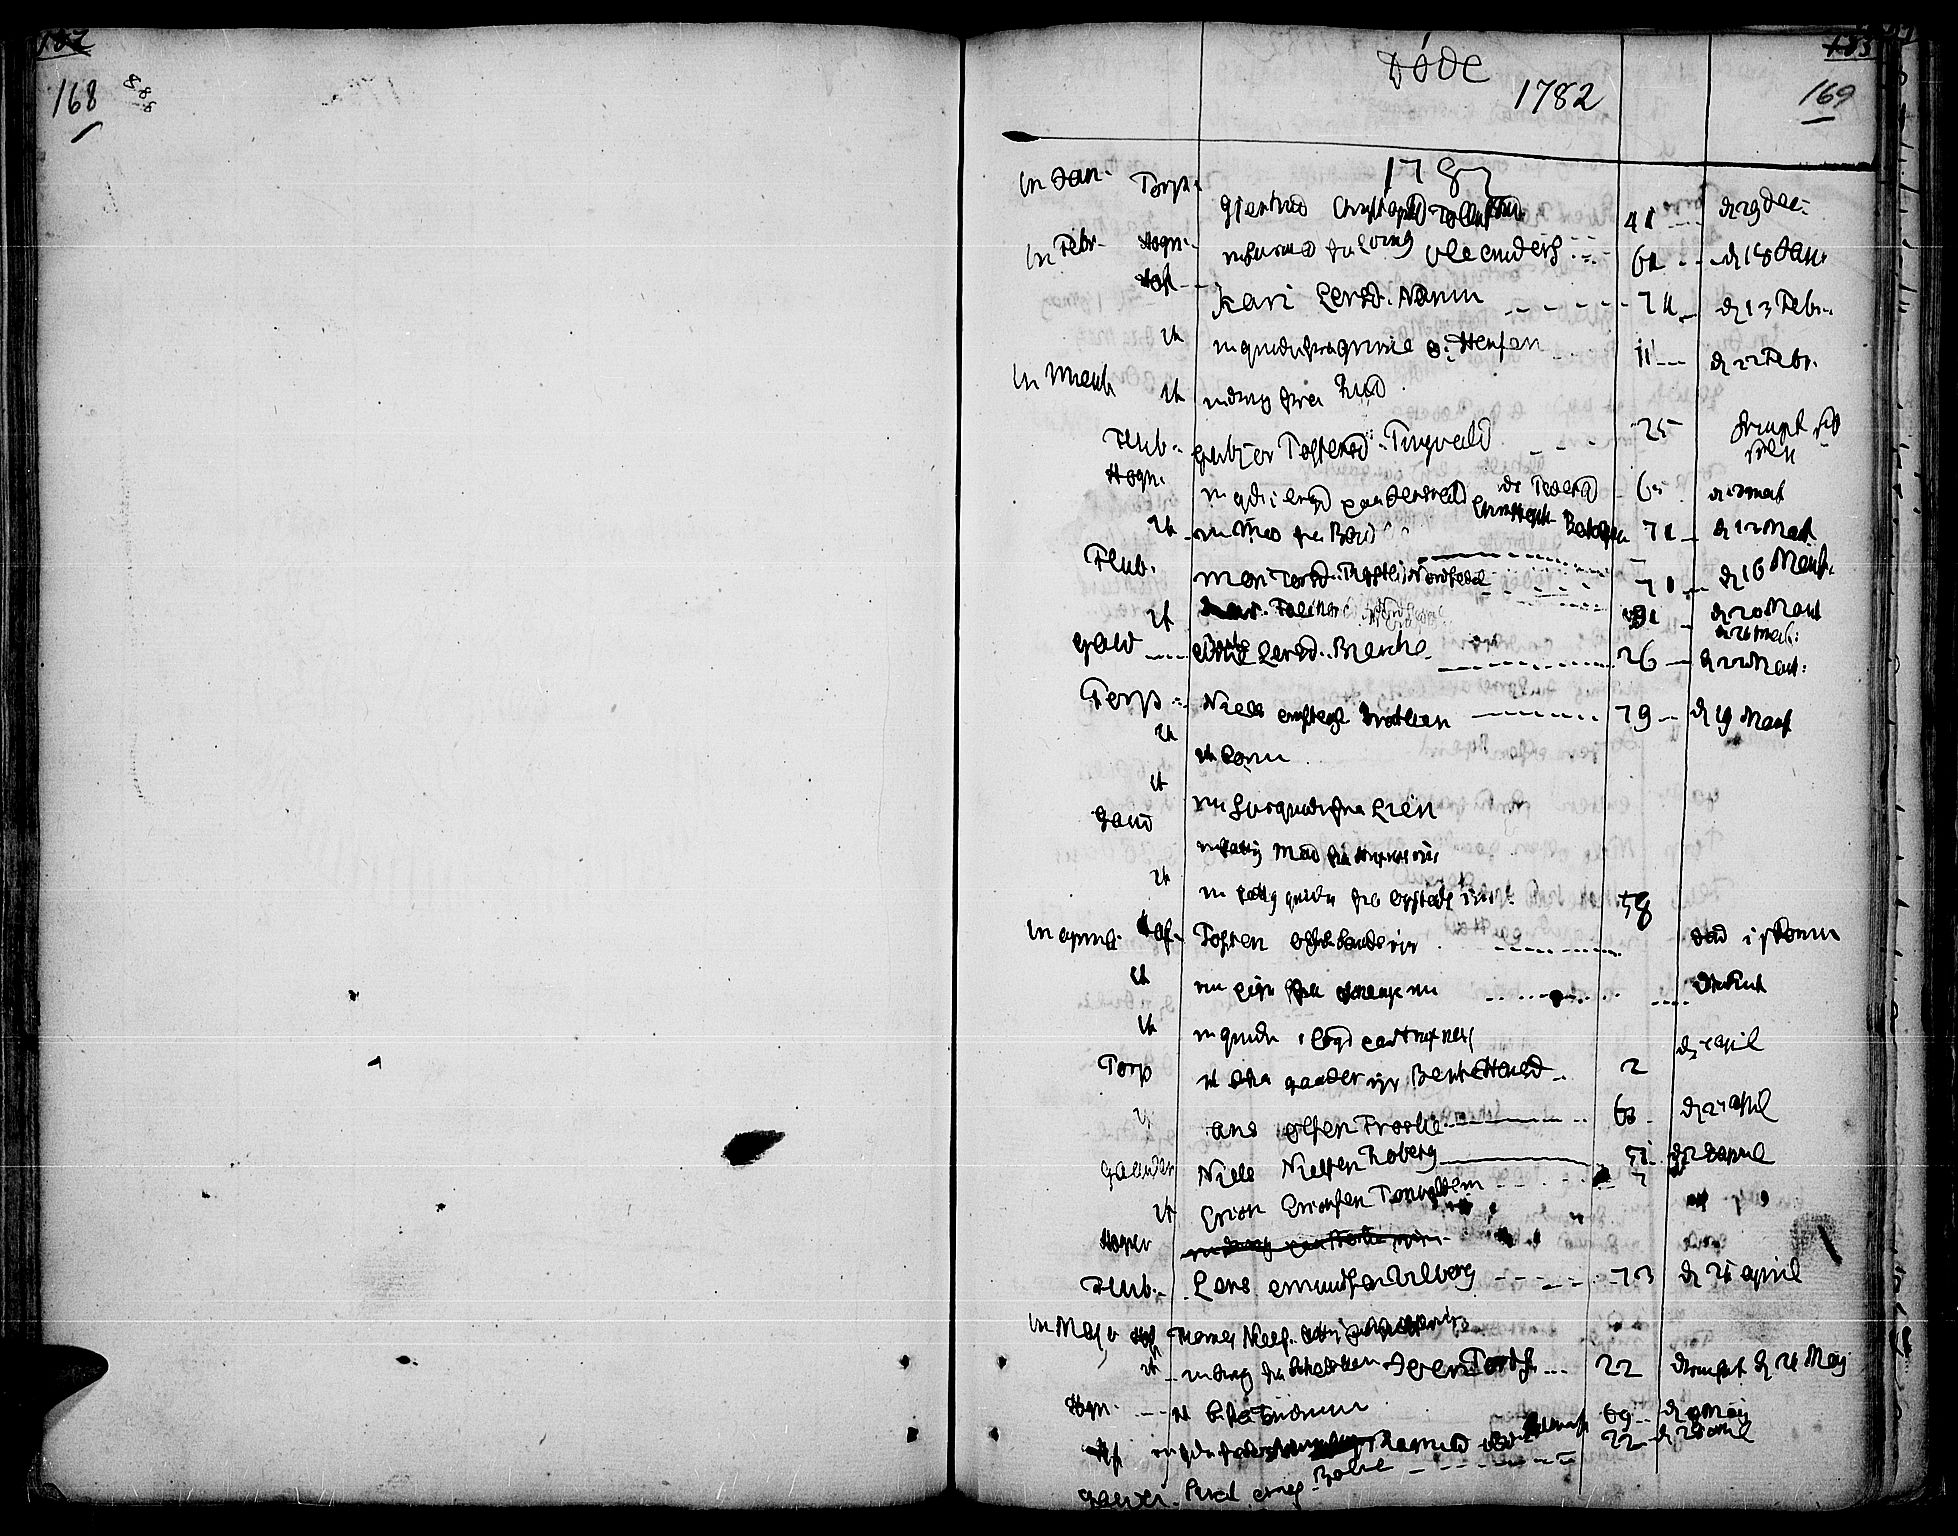 SAH, Land prestekontor, Ministerialbok nr. 5, 1765-1784, s. 168-169